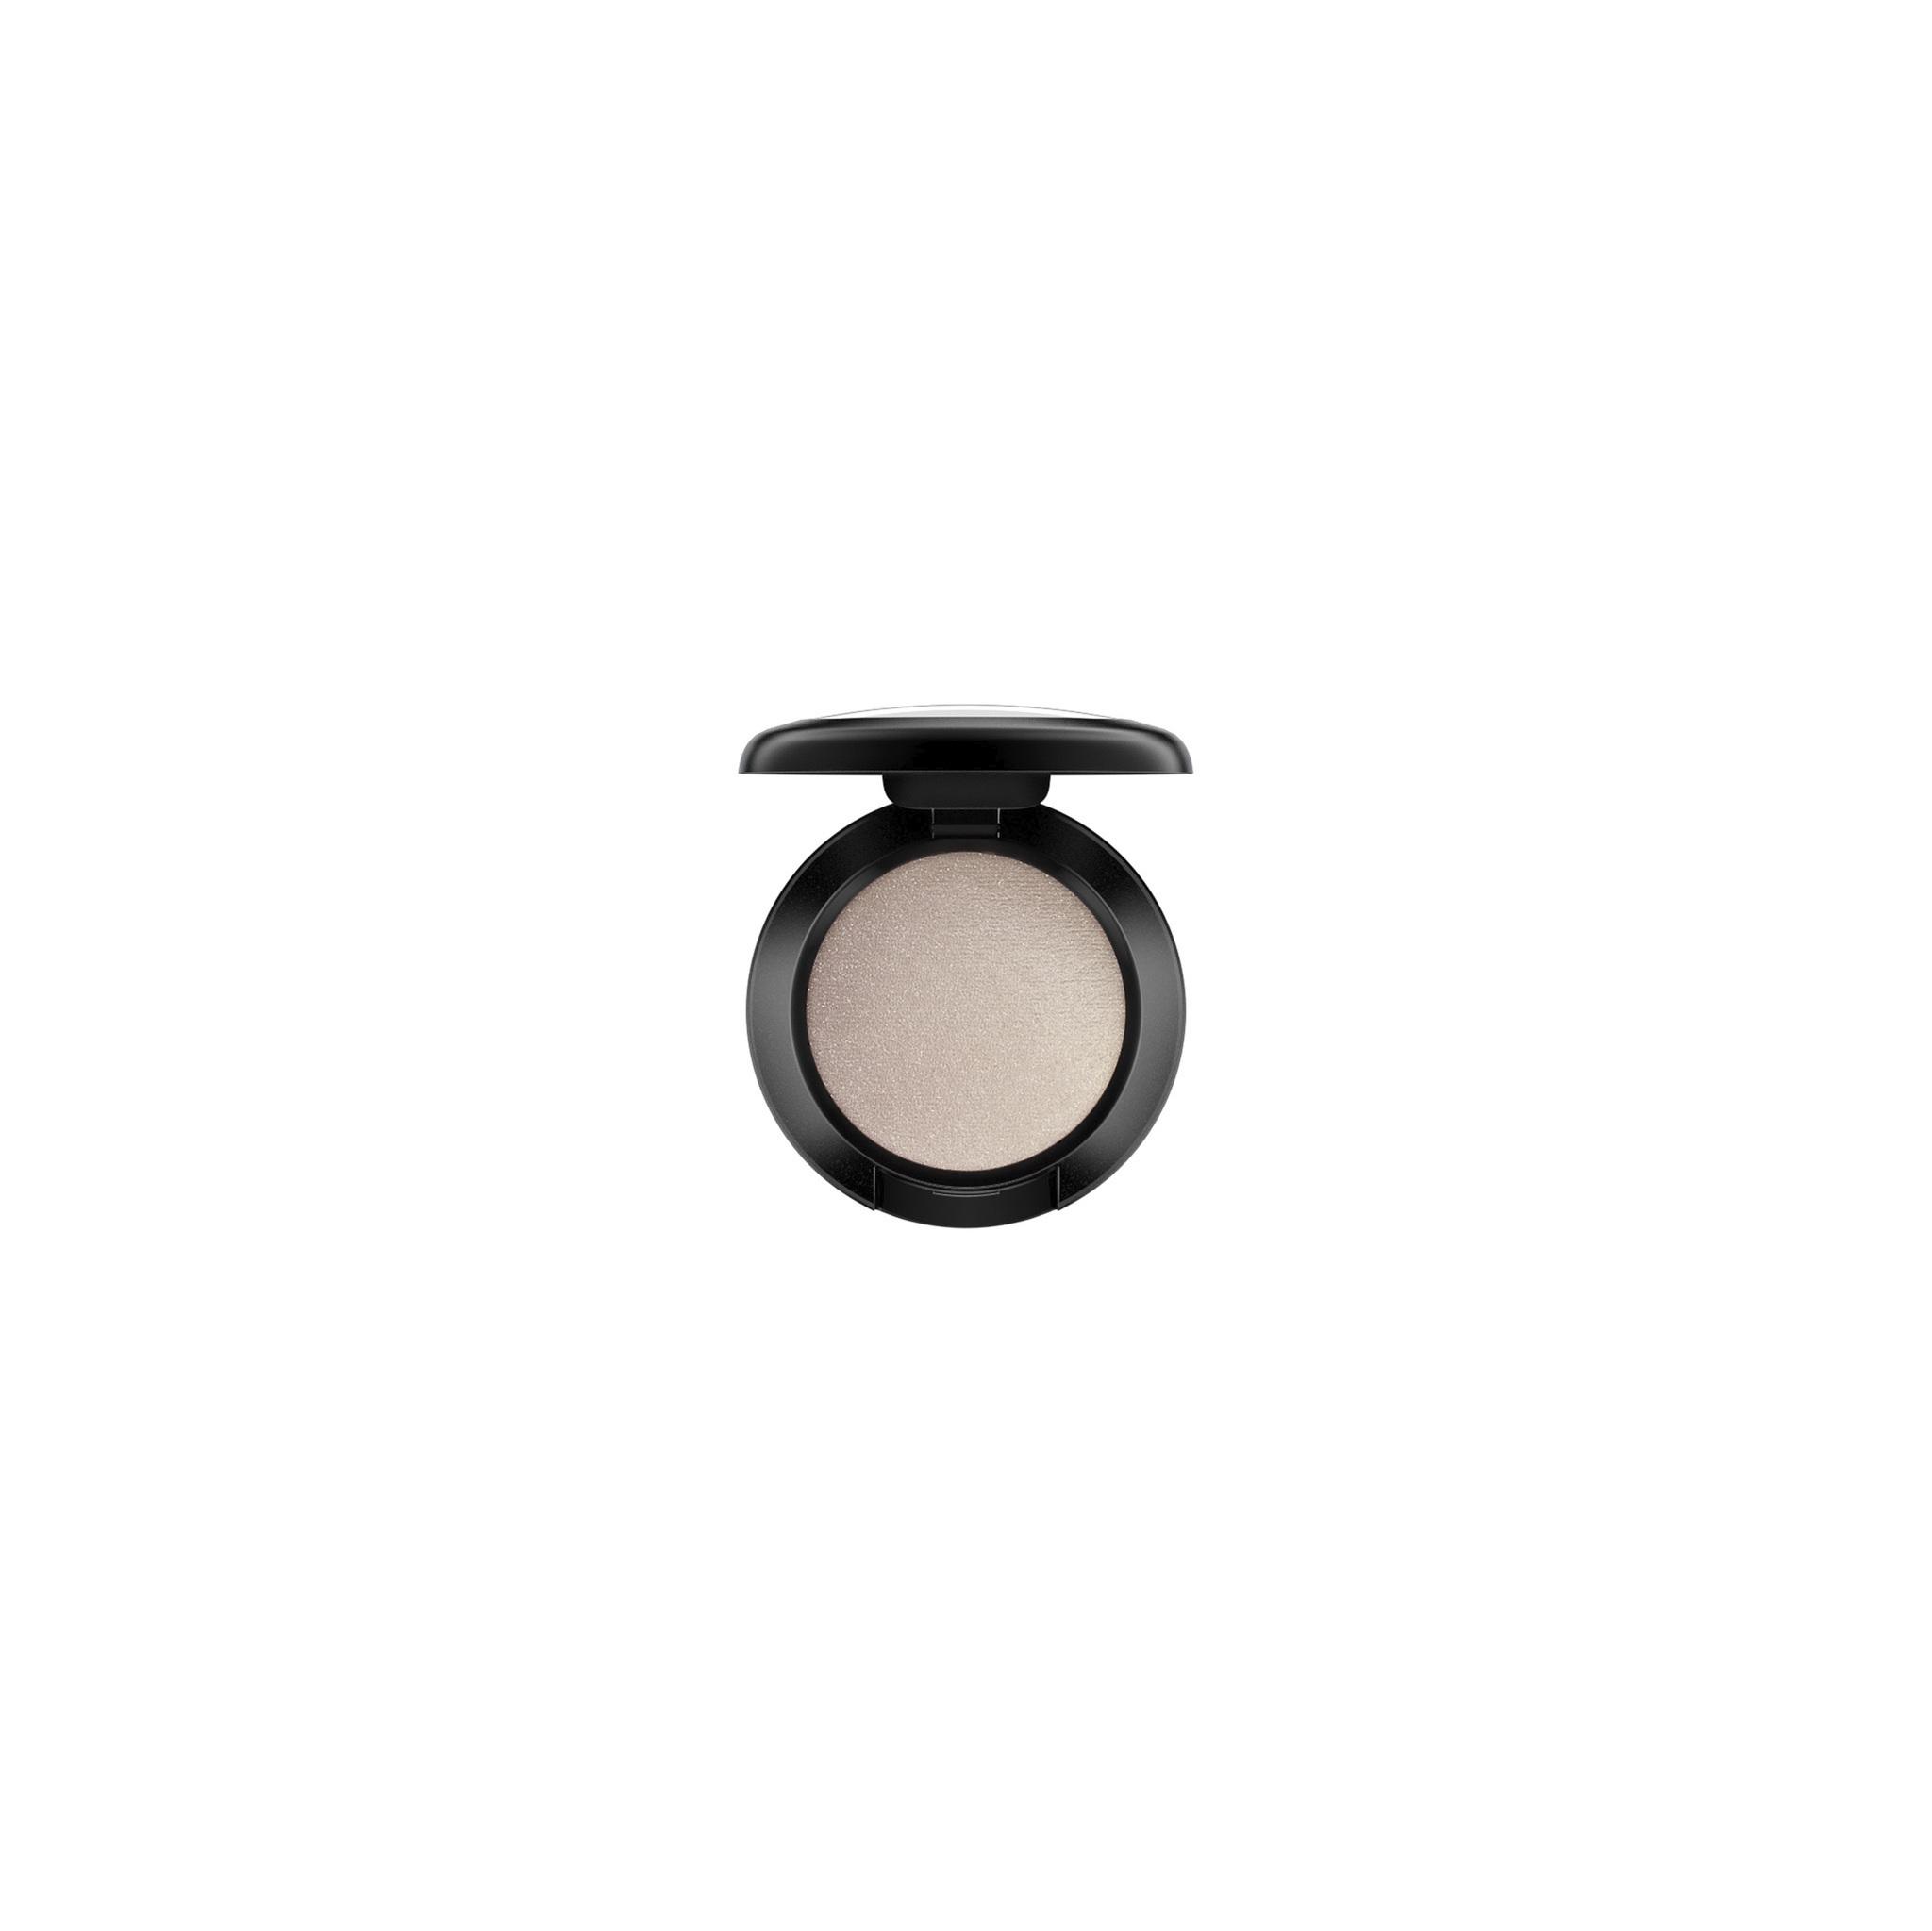 MAC Eye Shadow, vex